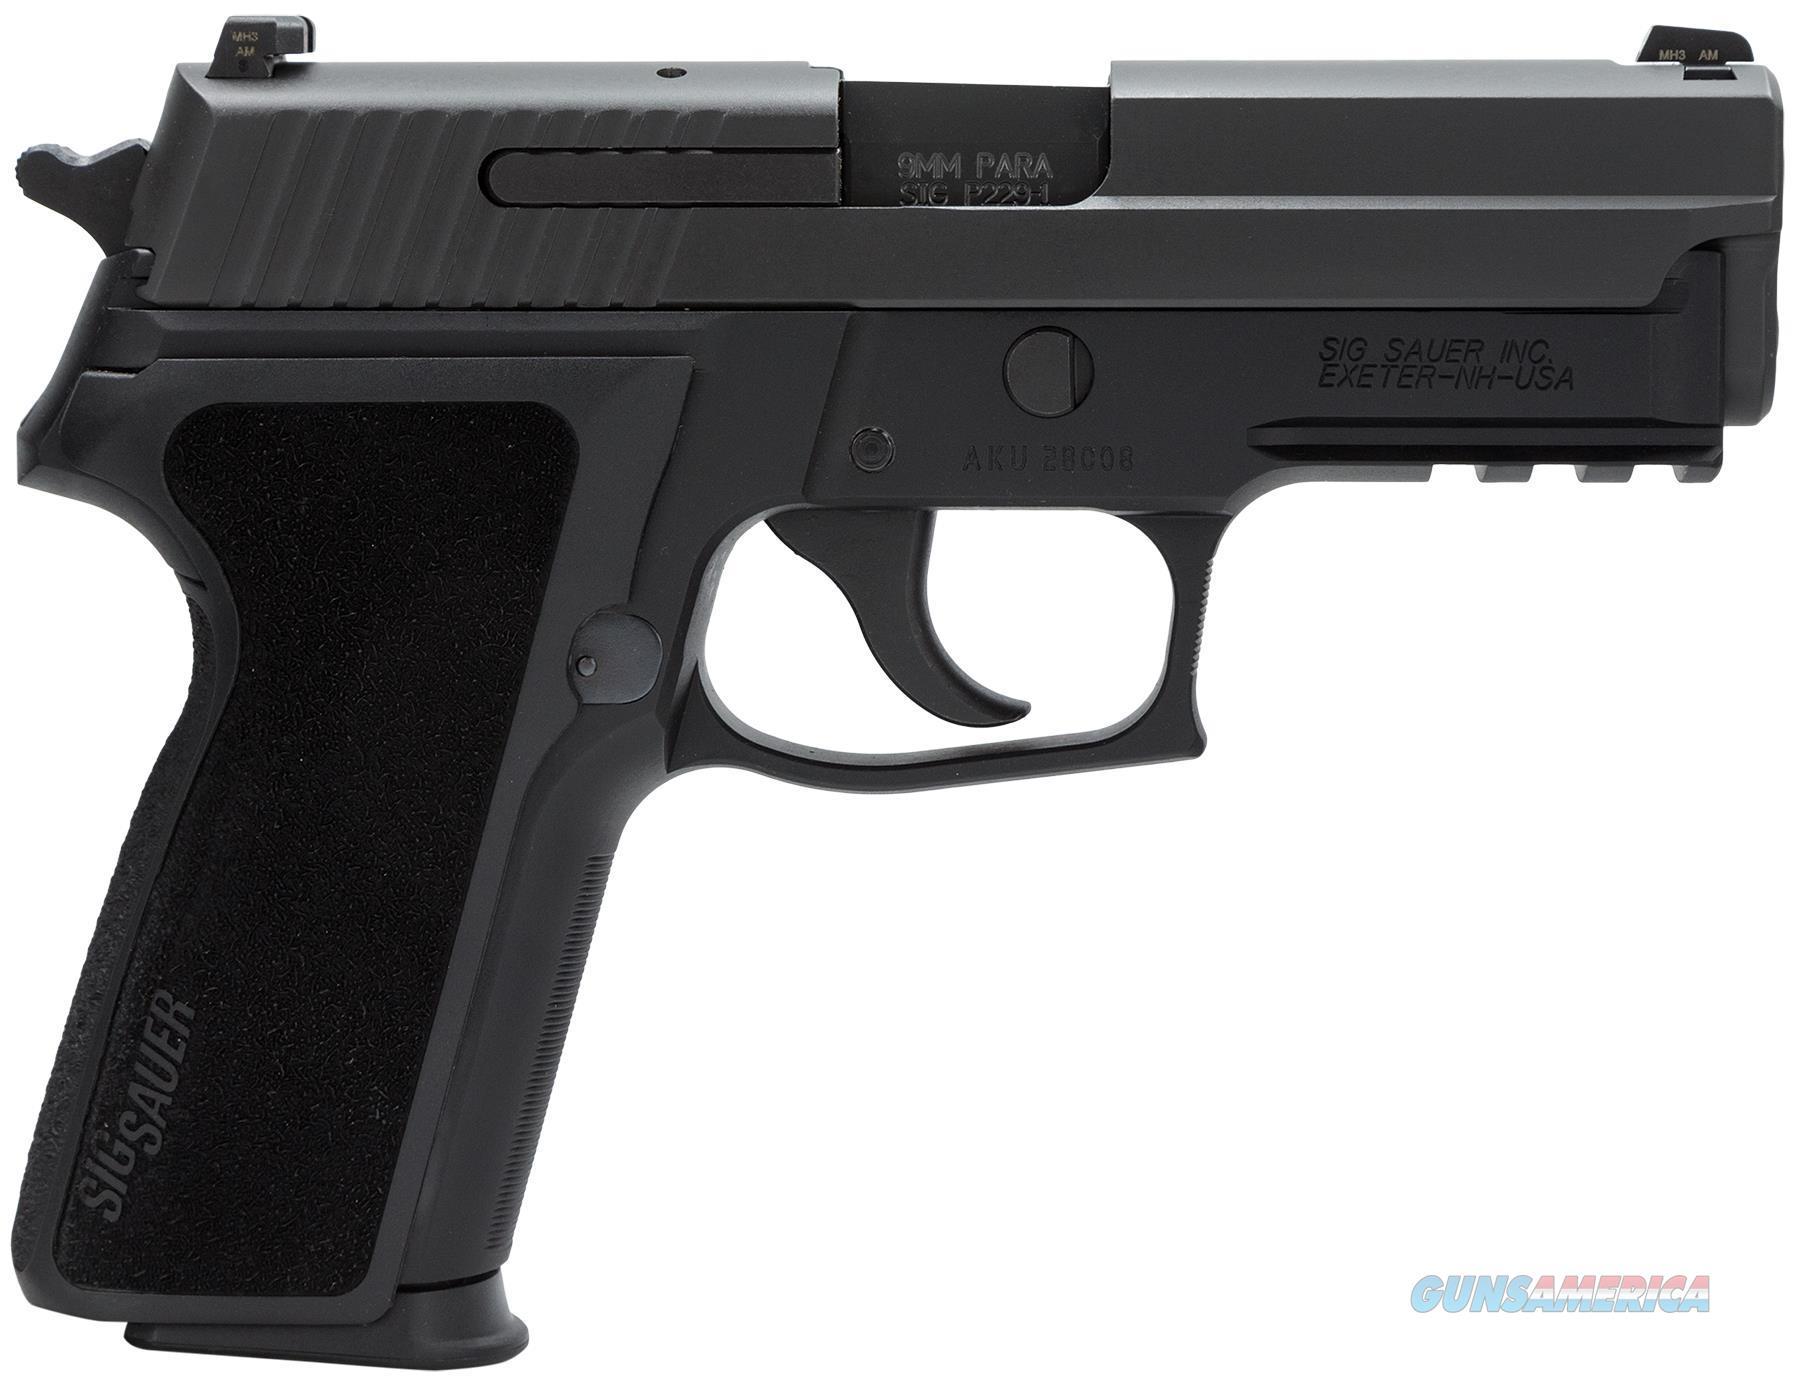 Sig Sauer P229 Standard Semi Auto Pistol 9Mm, 3.9 In, Poly Grp, 10+1 Rnd, Night, Compact Blk Frame, Da 229R-9-BSS-CA  Guns > Pistols > S Misc Pistols